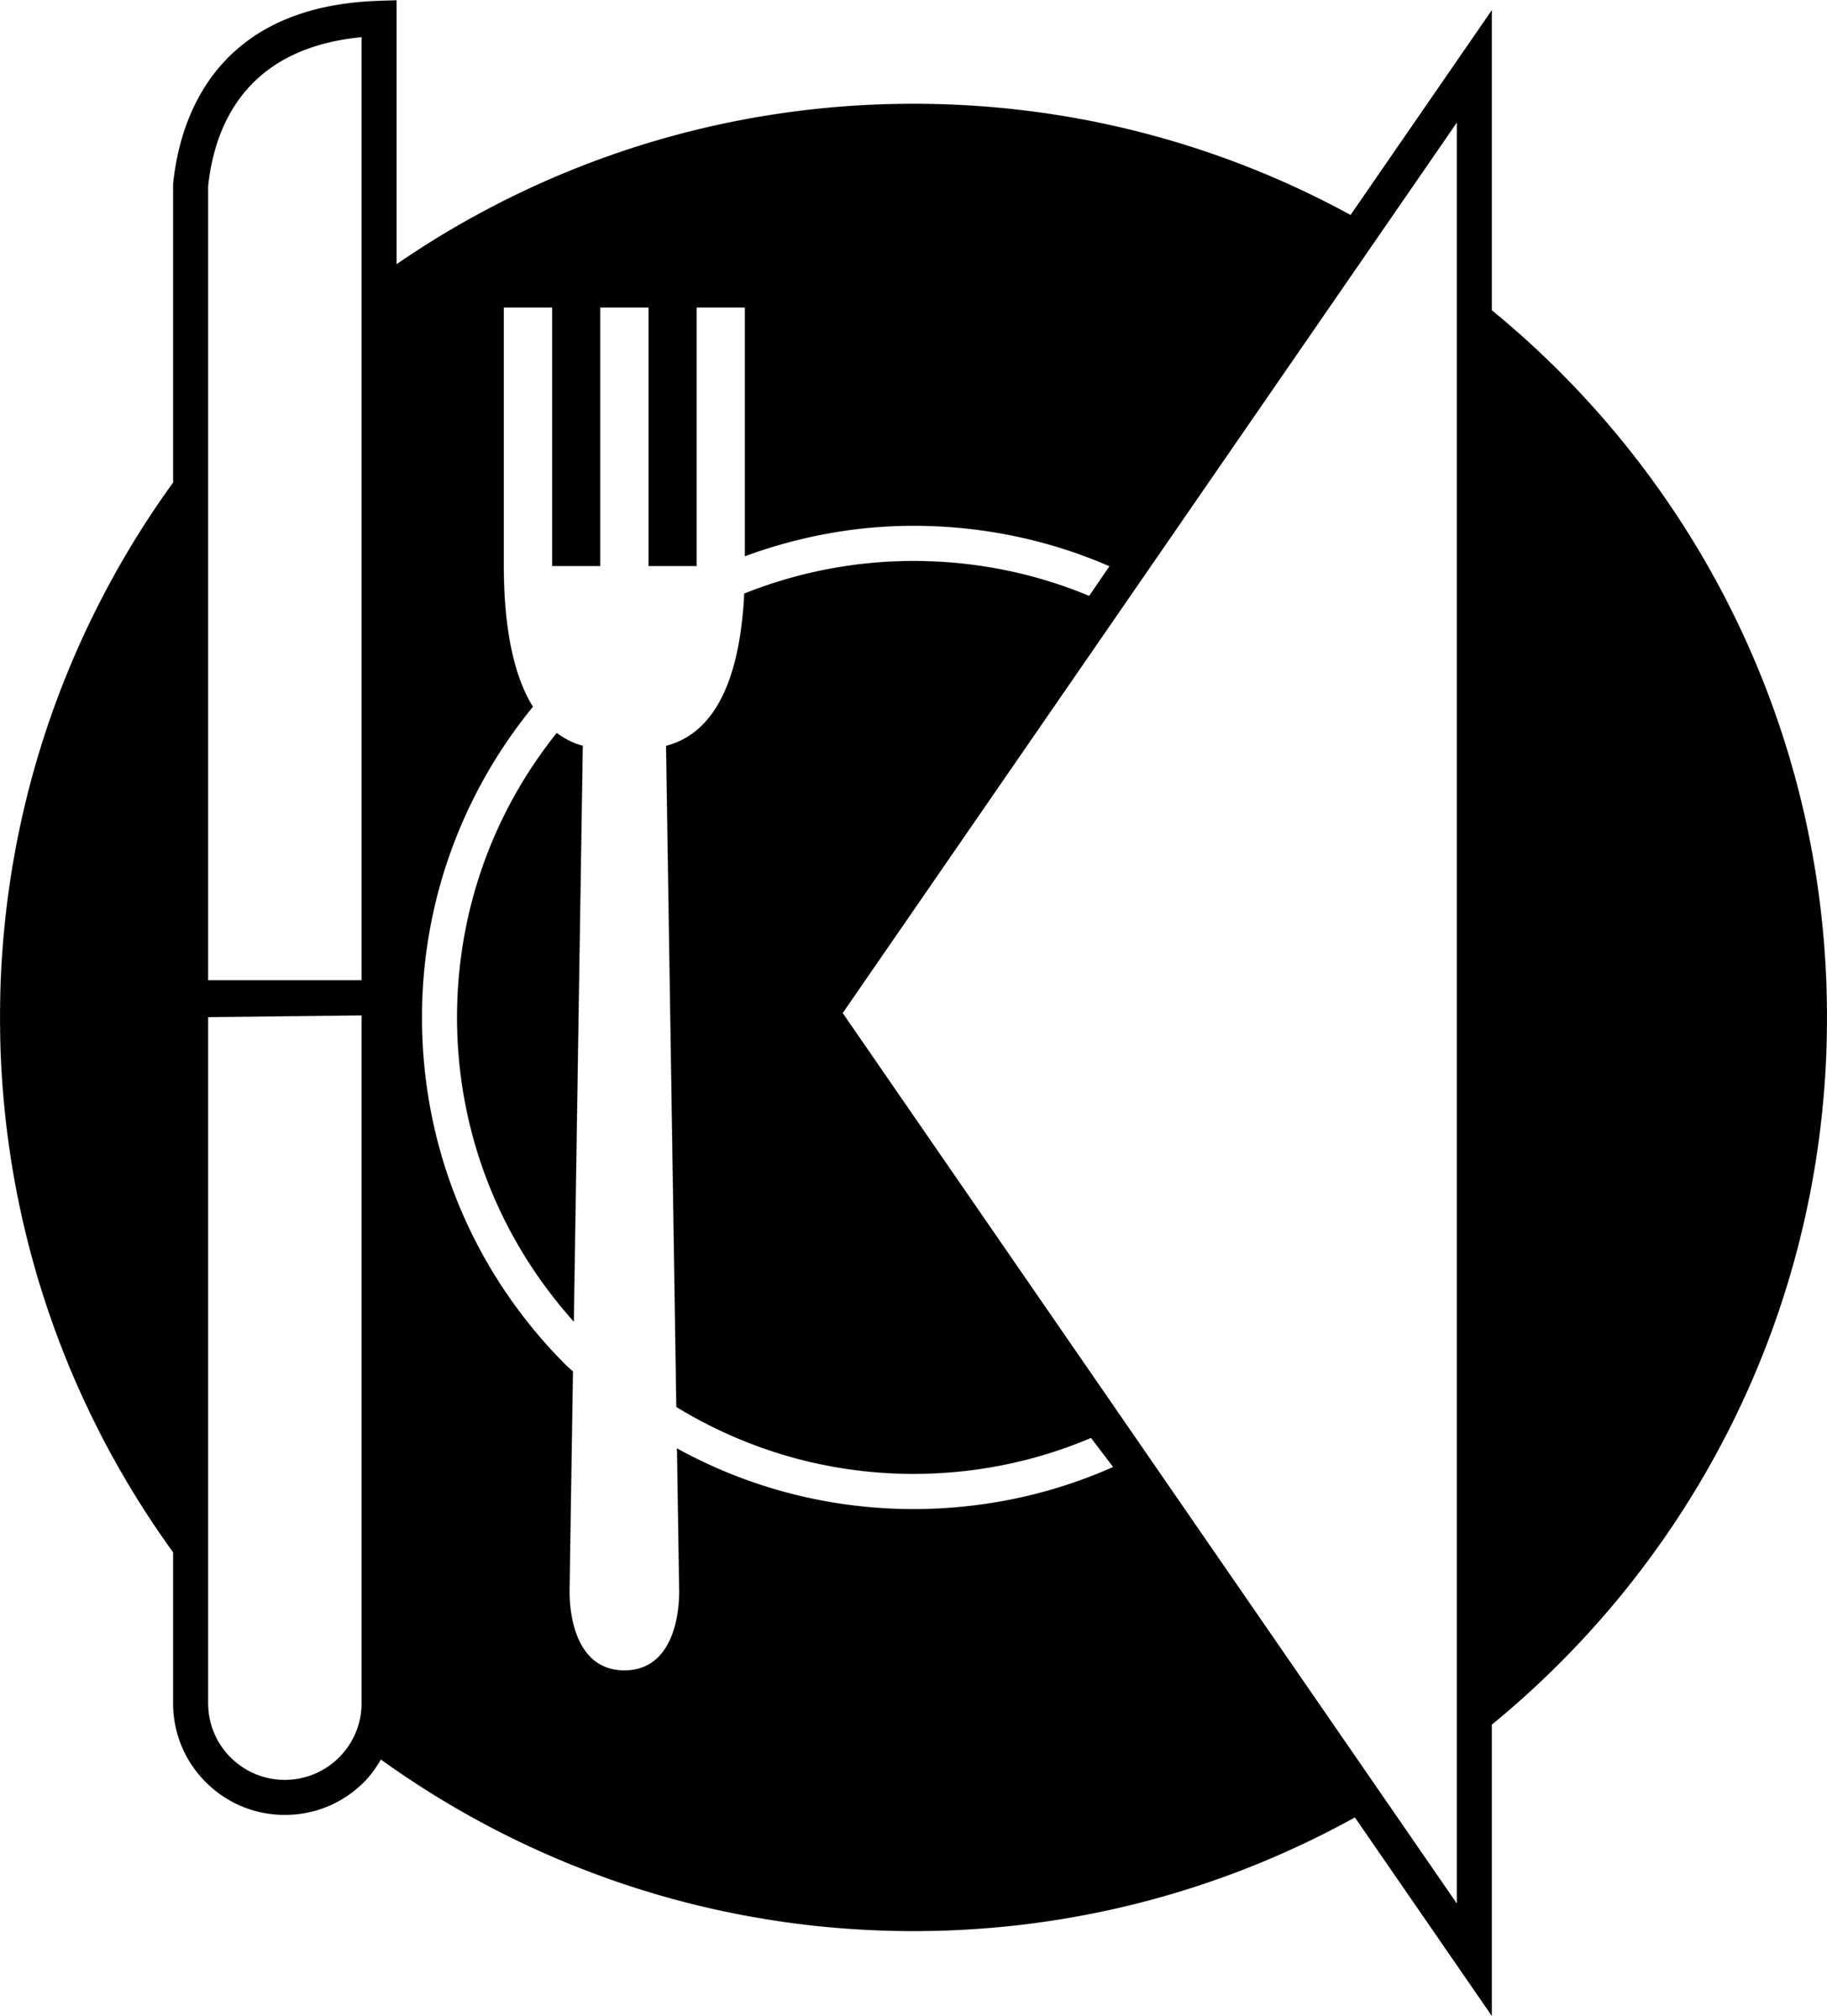 Breakfast lunch dinner clipart black and white vector royalty free Free Dinner Clip Art, Download Free Clip Art, Free Clip Art on ... vector royalty free